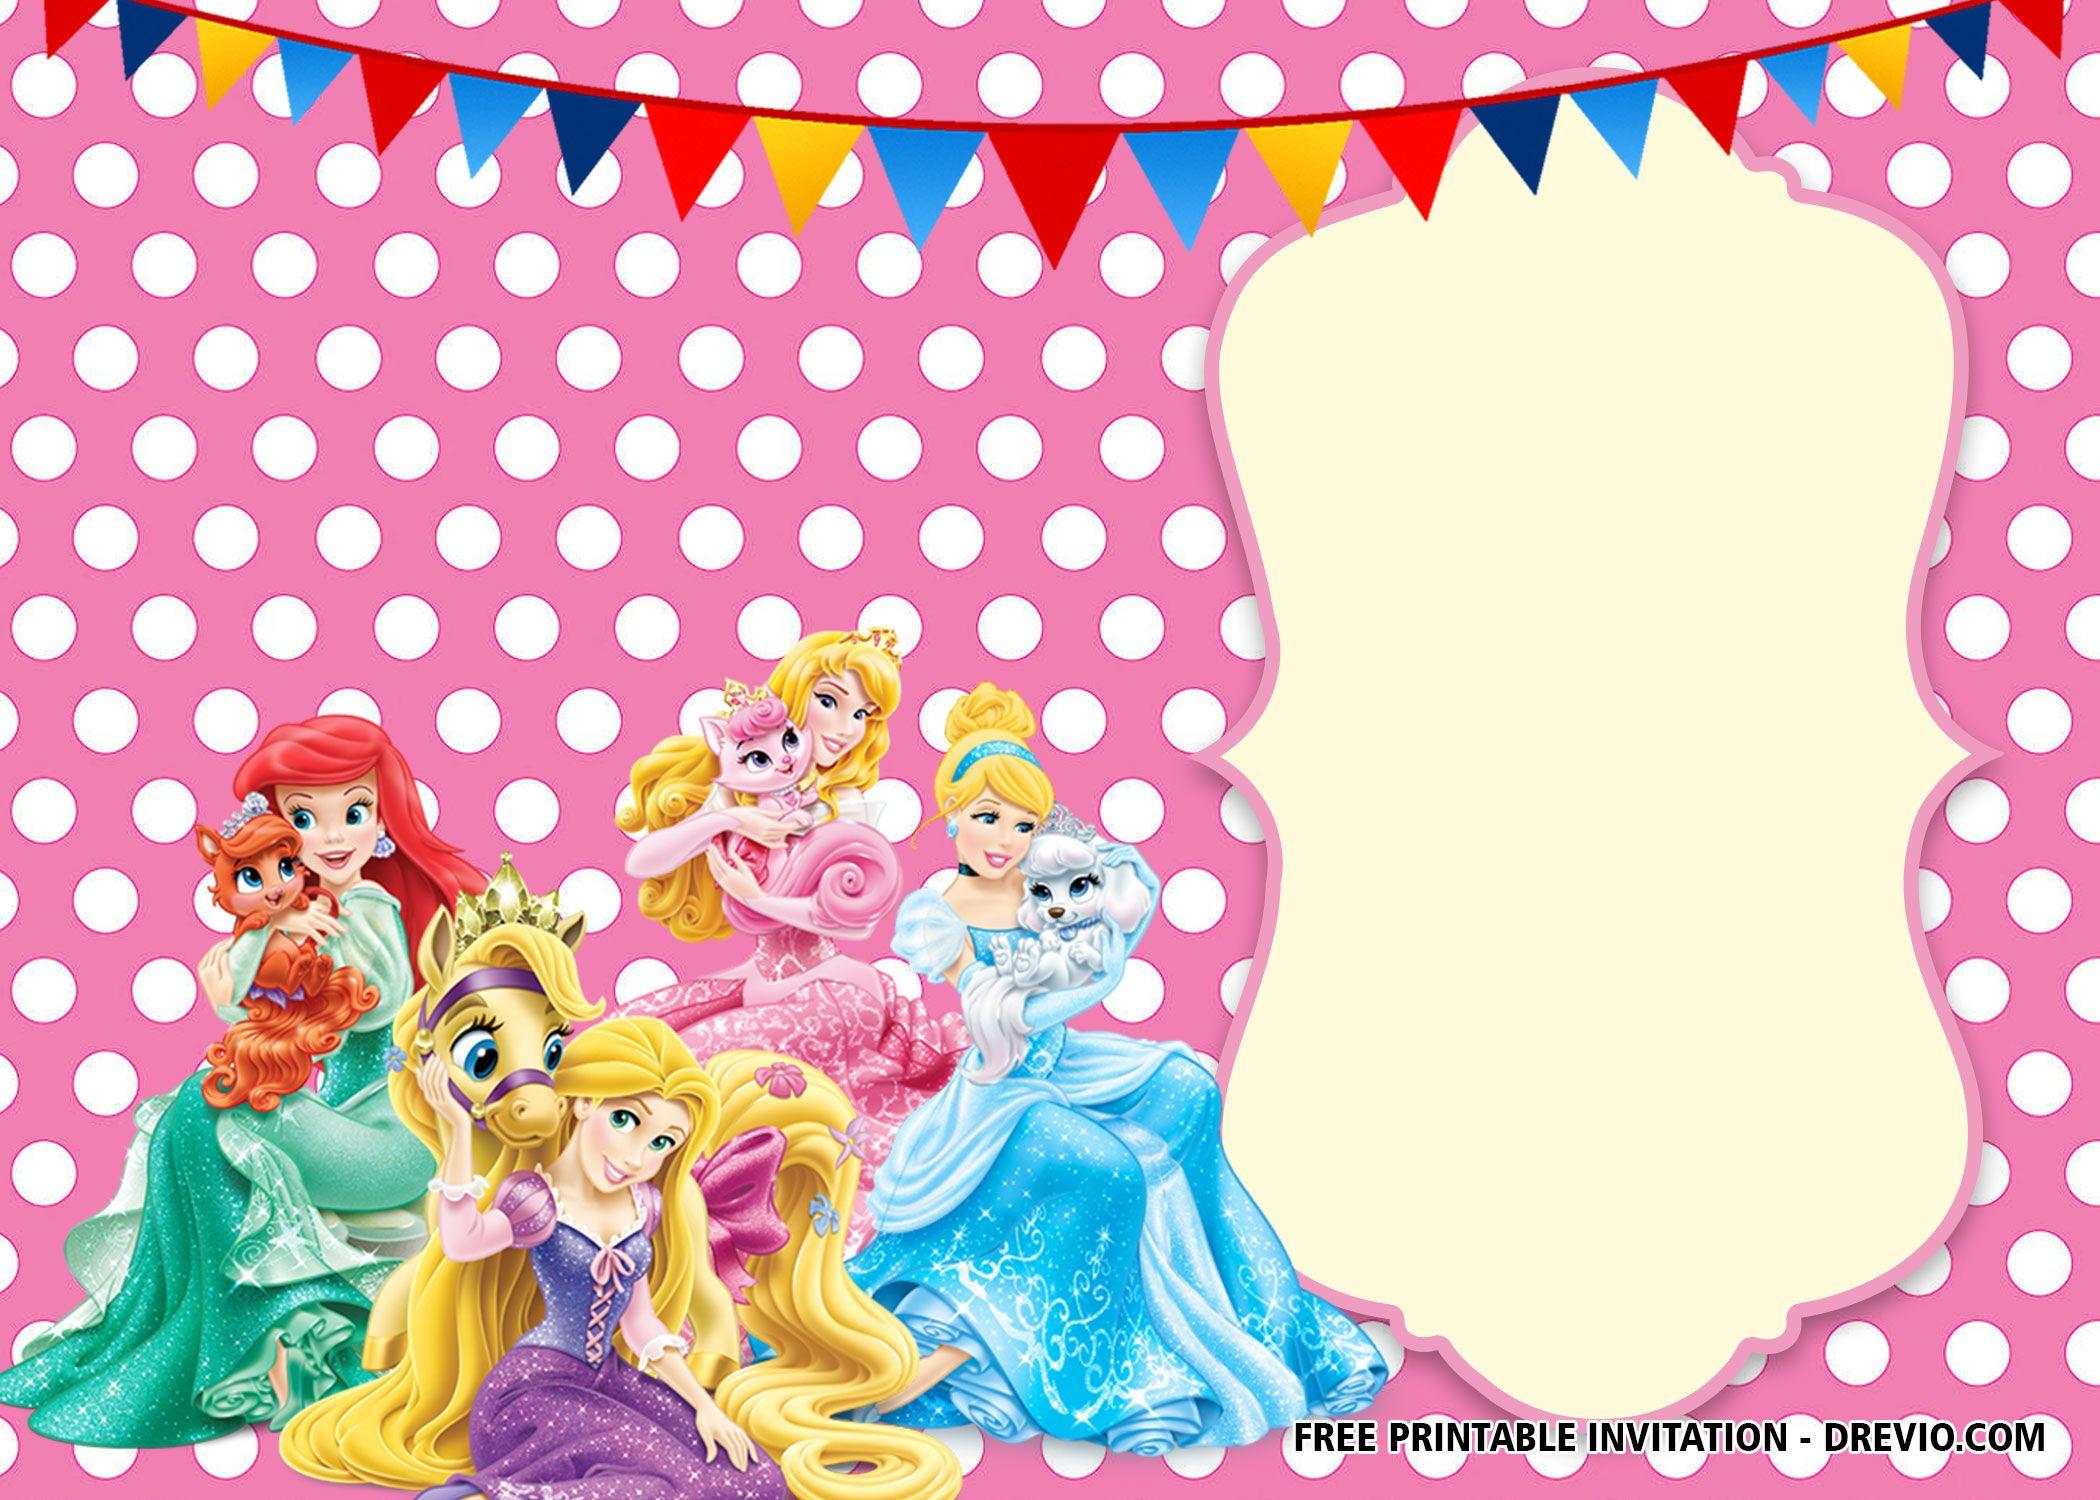 FREE Printable Disney Princess Polkadot Invitation ...